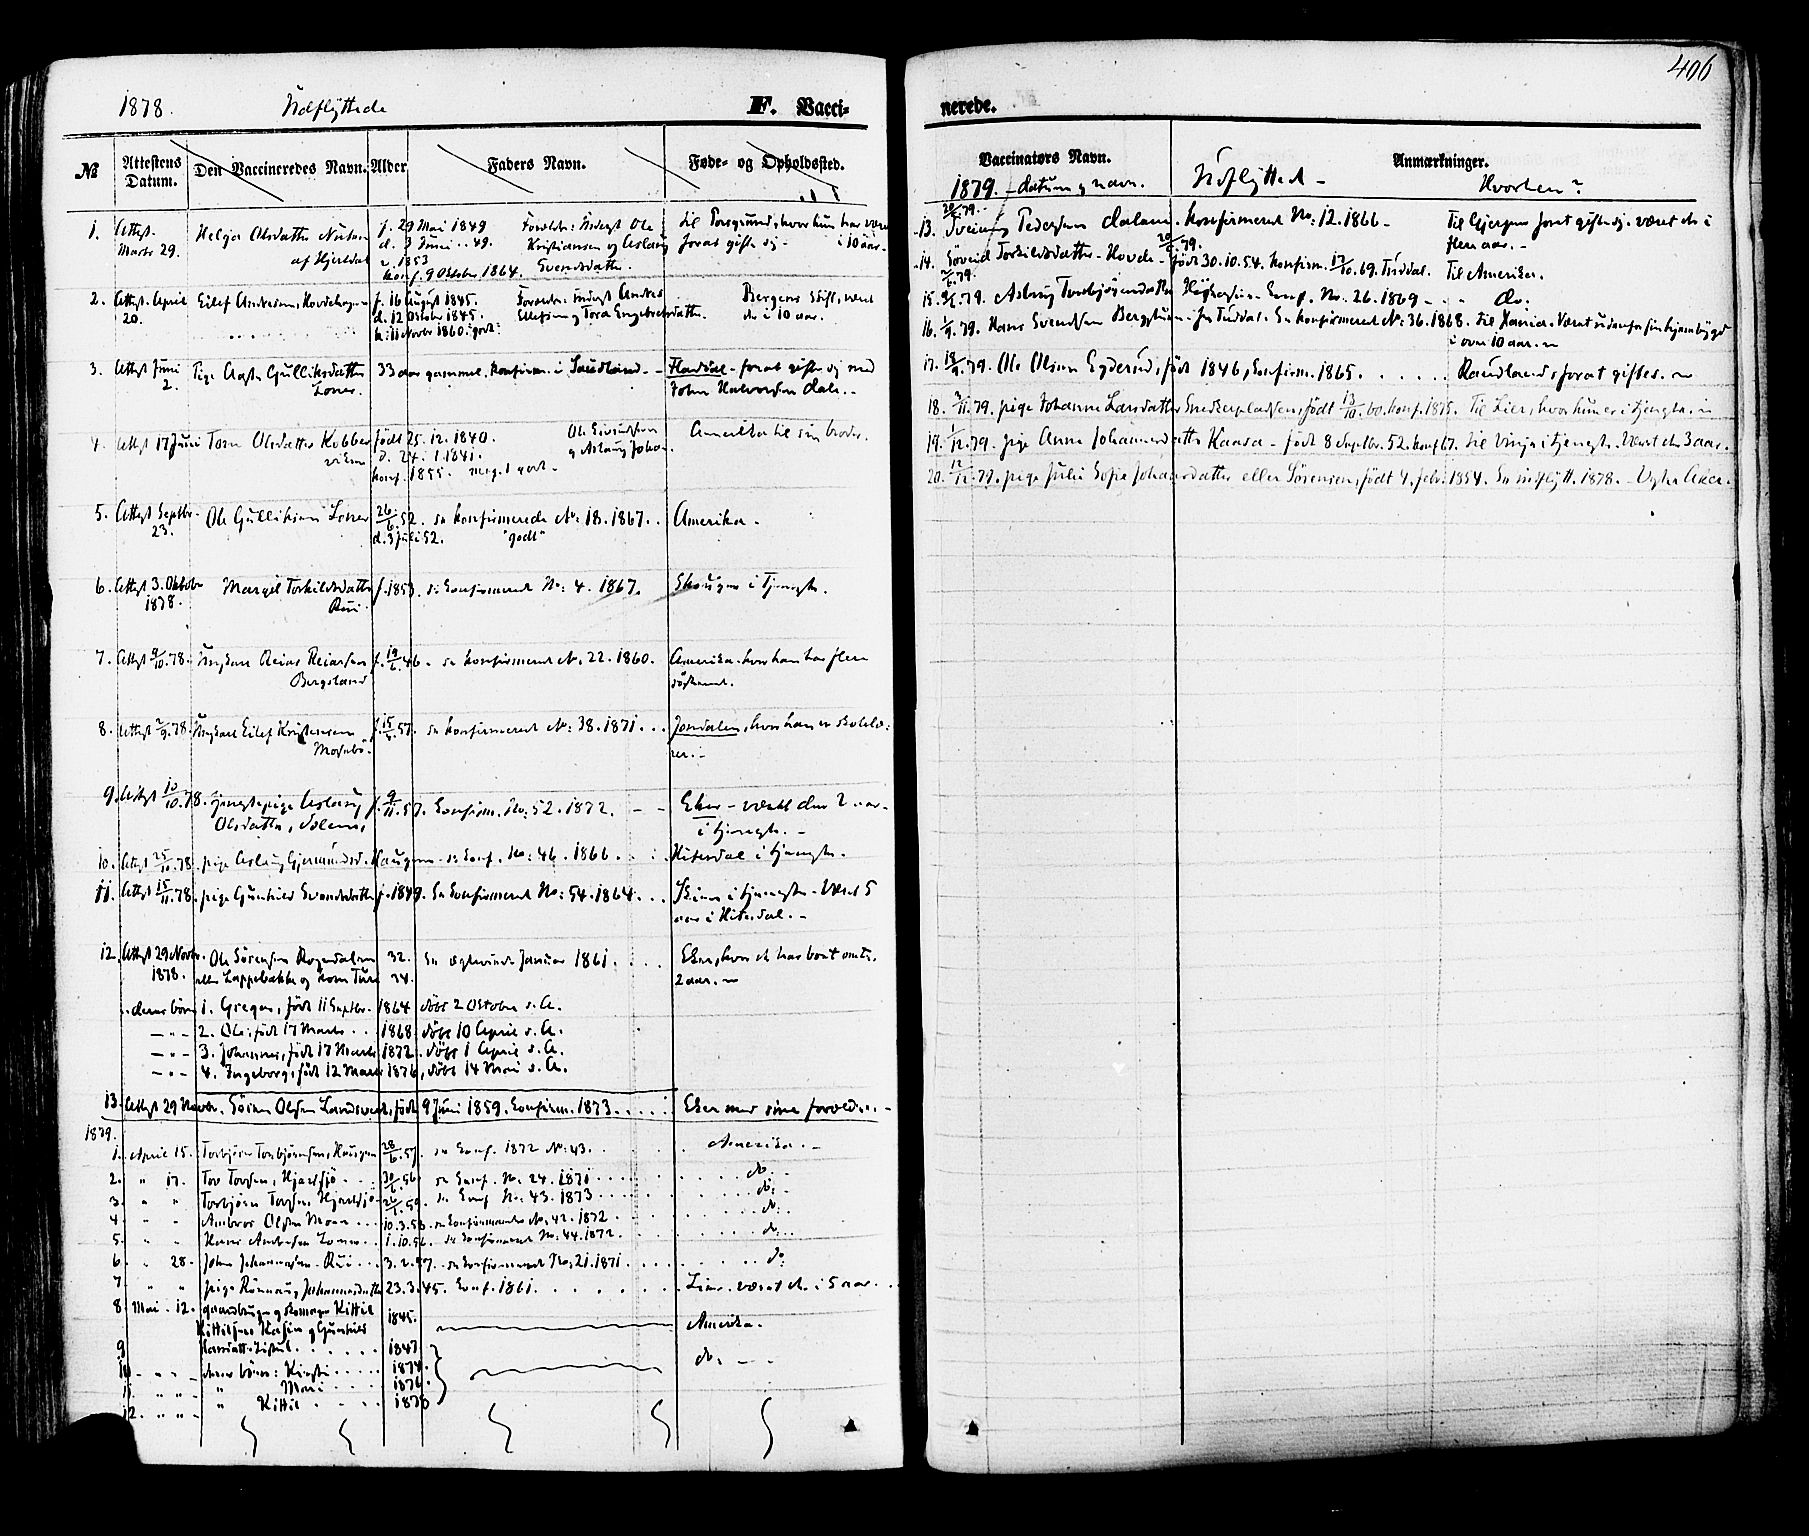 SAKO, Hjartdal kirkebøker, F/Fa/L0009: Ministerialbok nr. I 9, 1860-1879, s. 406